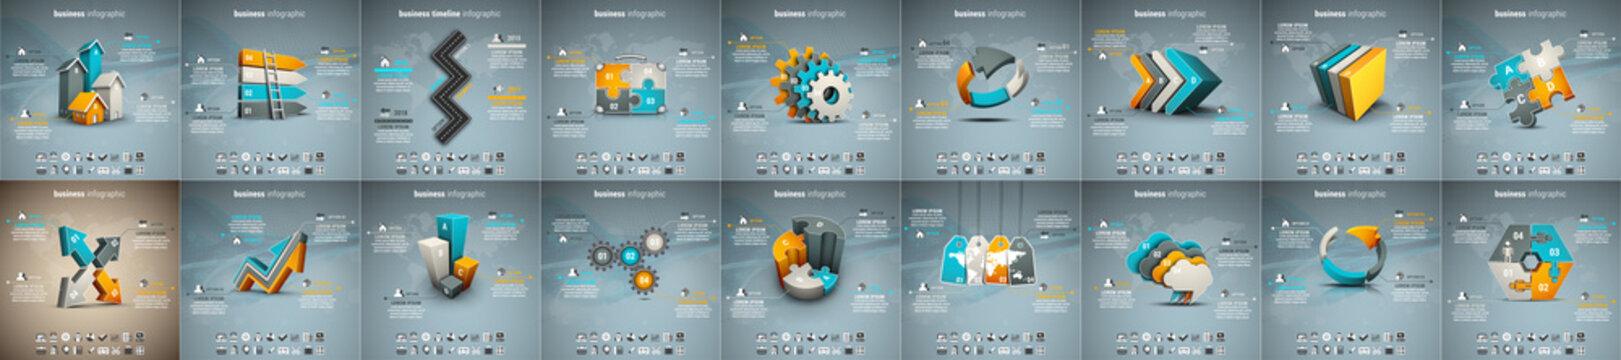 Best infographic templates presentation slides set. Circle diagrams, timelines, light bulb, puzzle brain head, brush stroke banners. Medicine, education, ecology, business infographics.